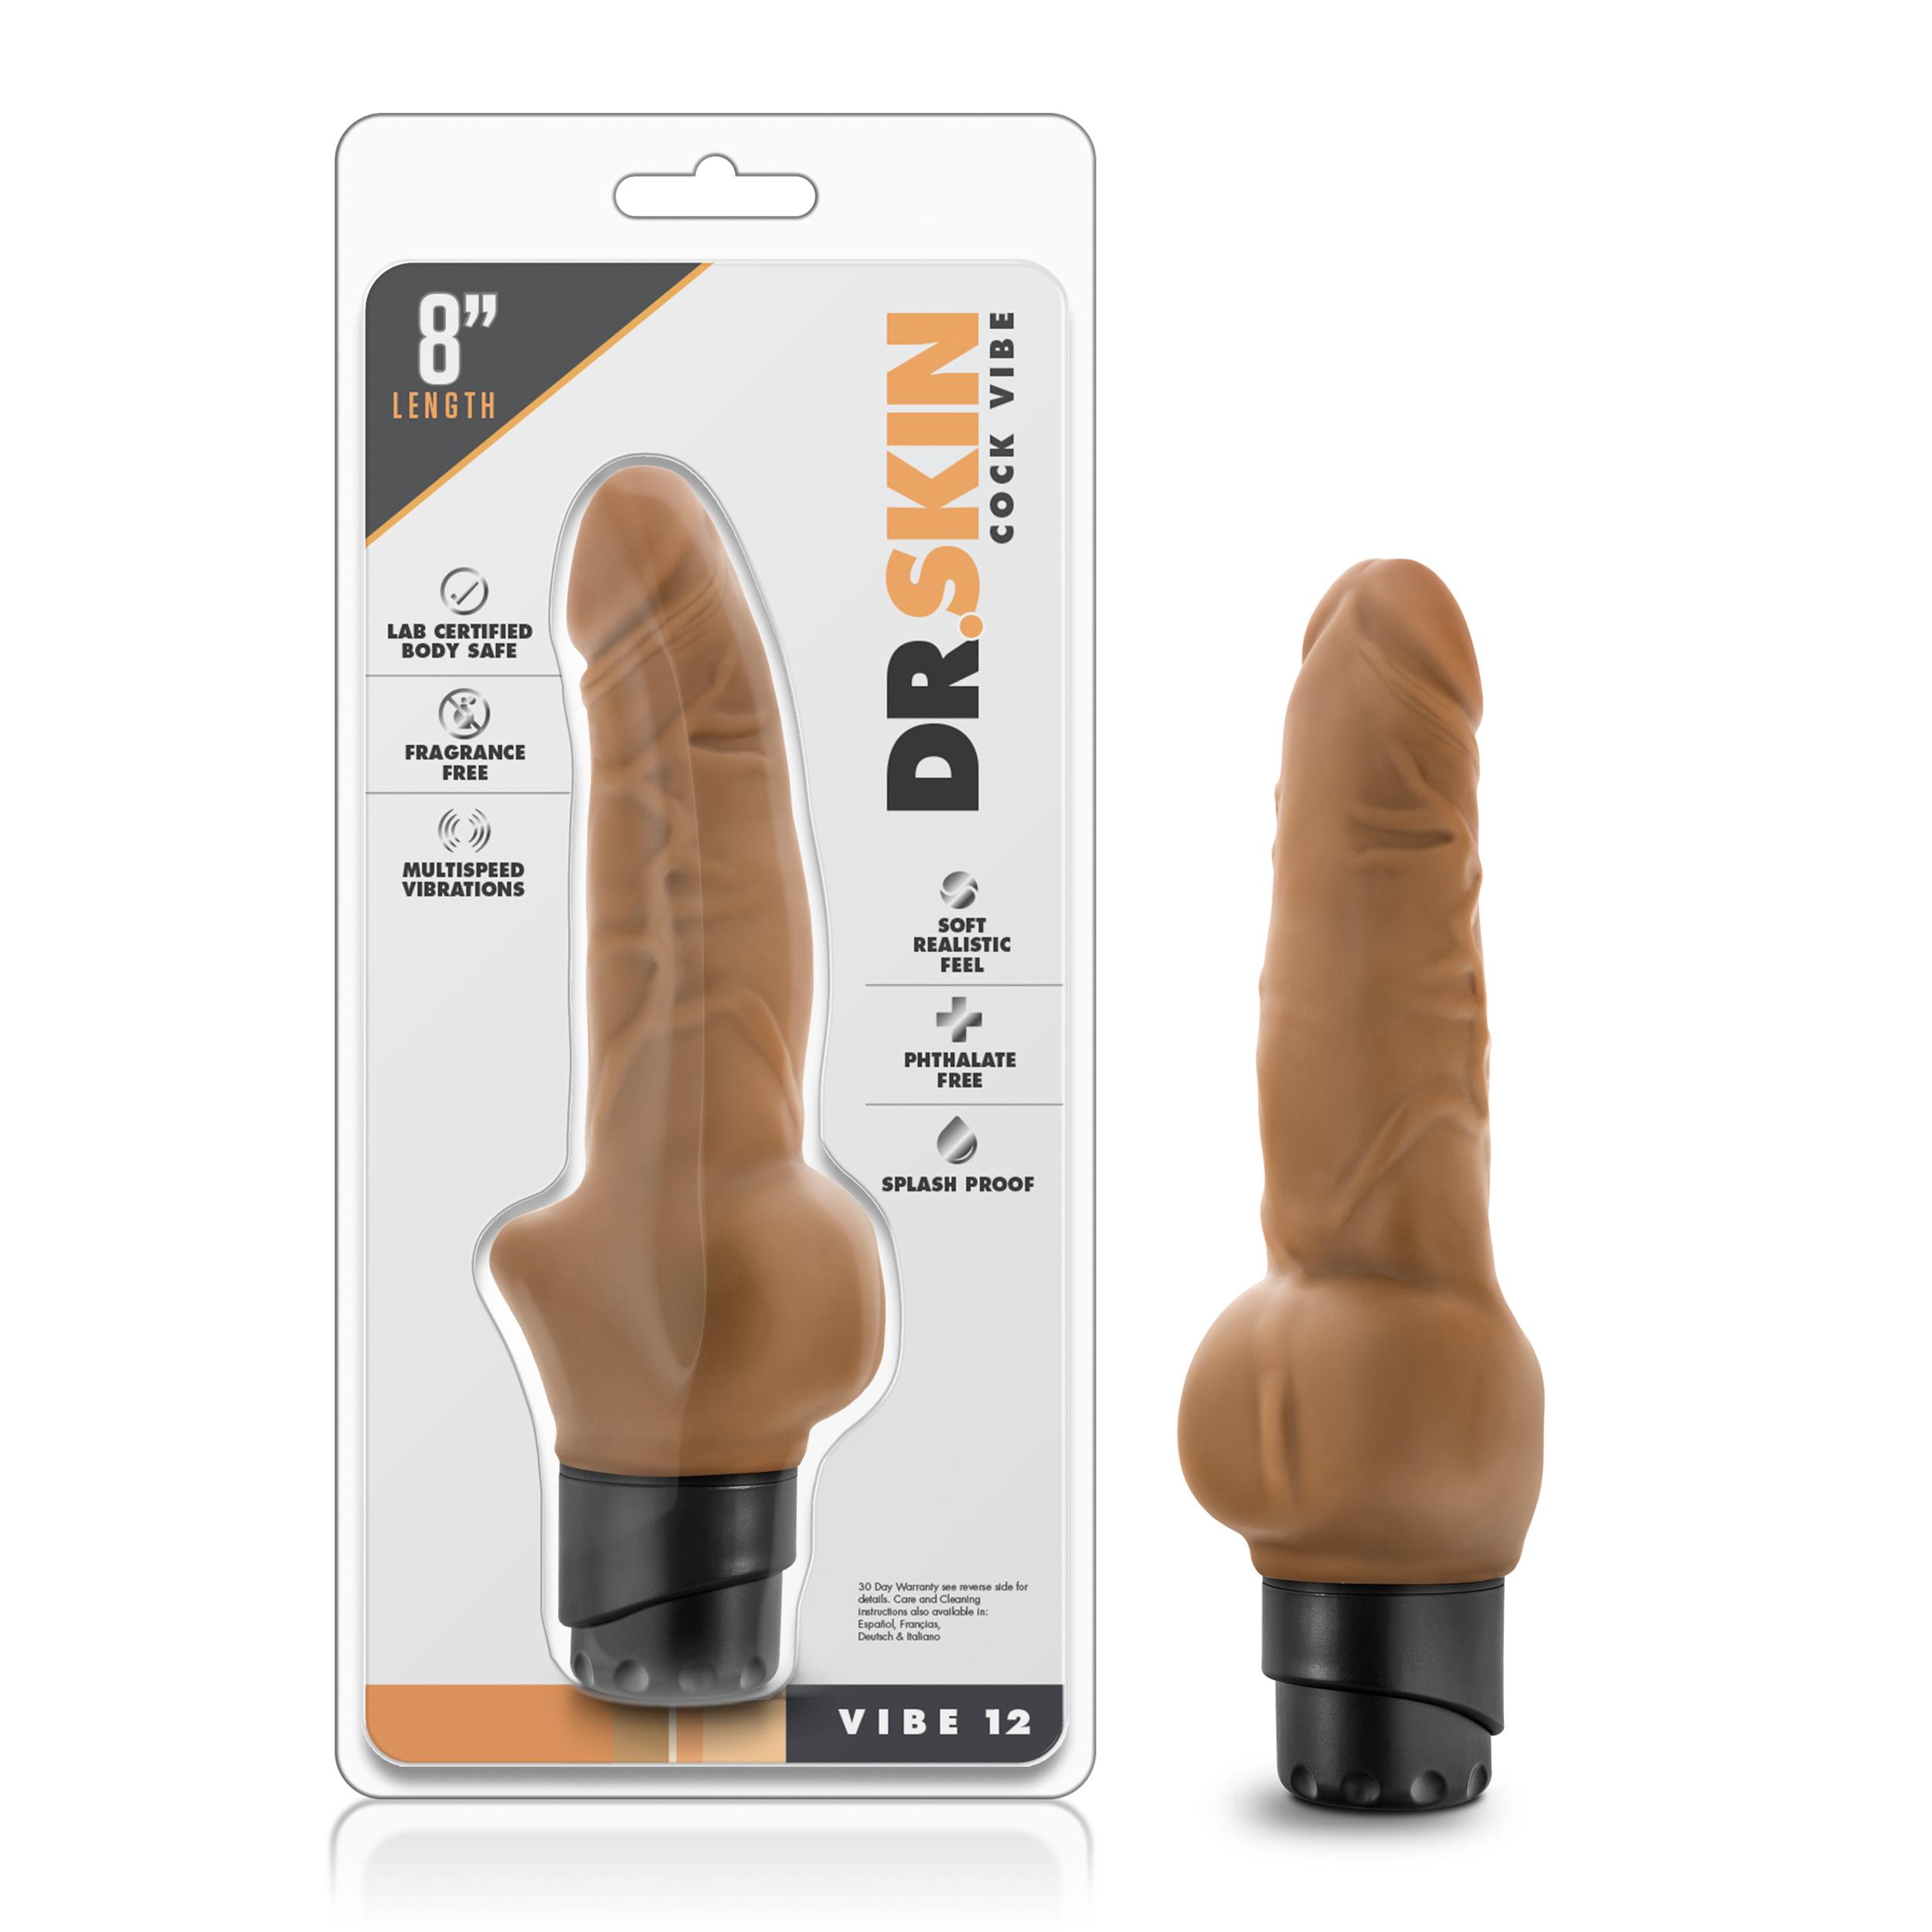 Dr. Skin - Cock Vibe 12 - 8 Inch Vibrating Cock - Mocha